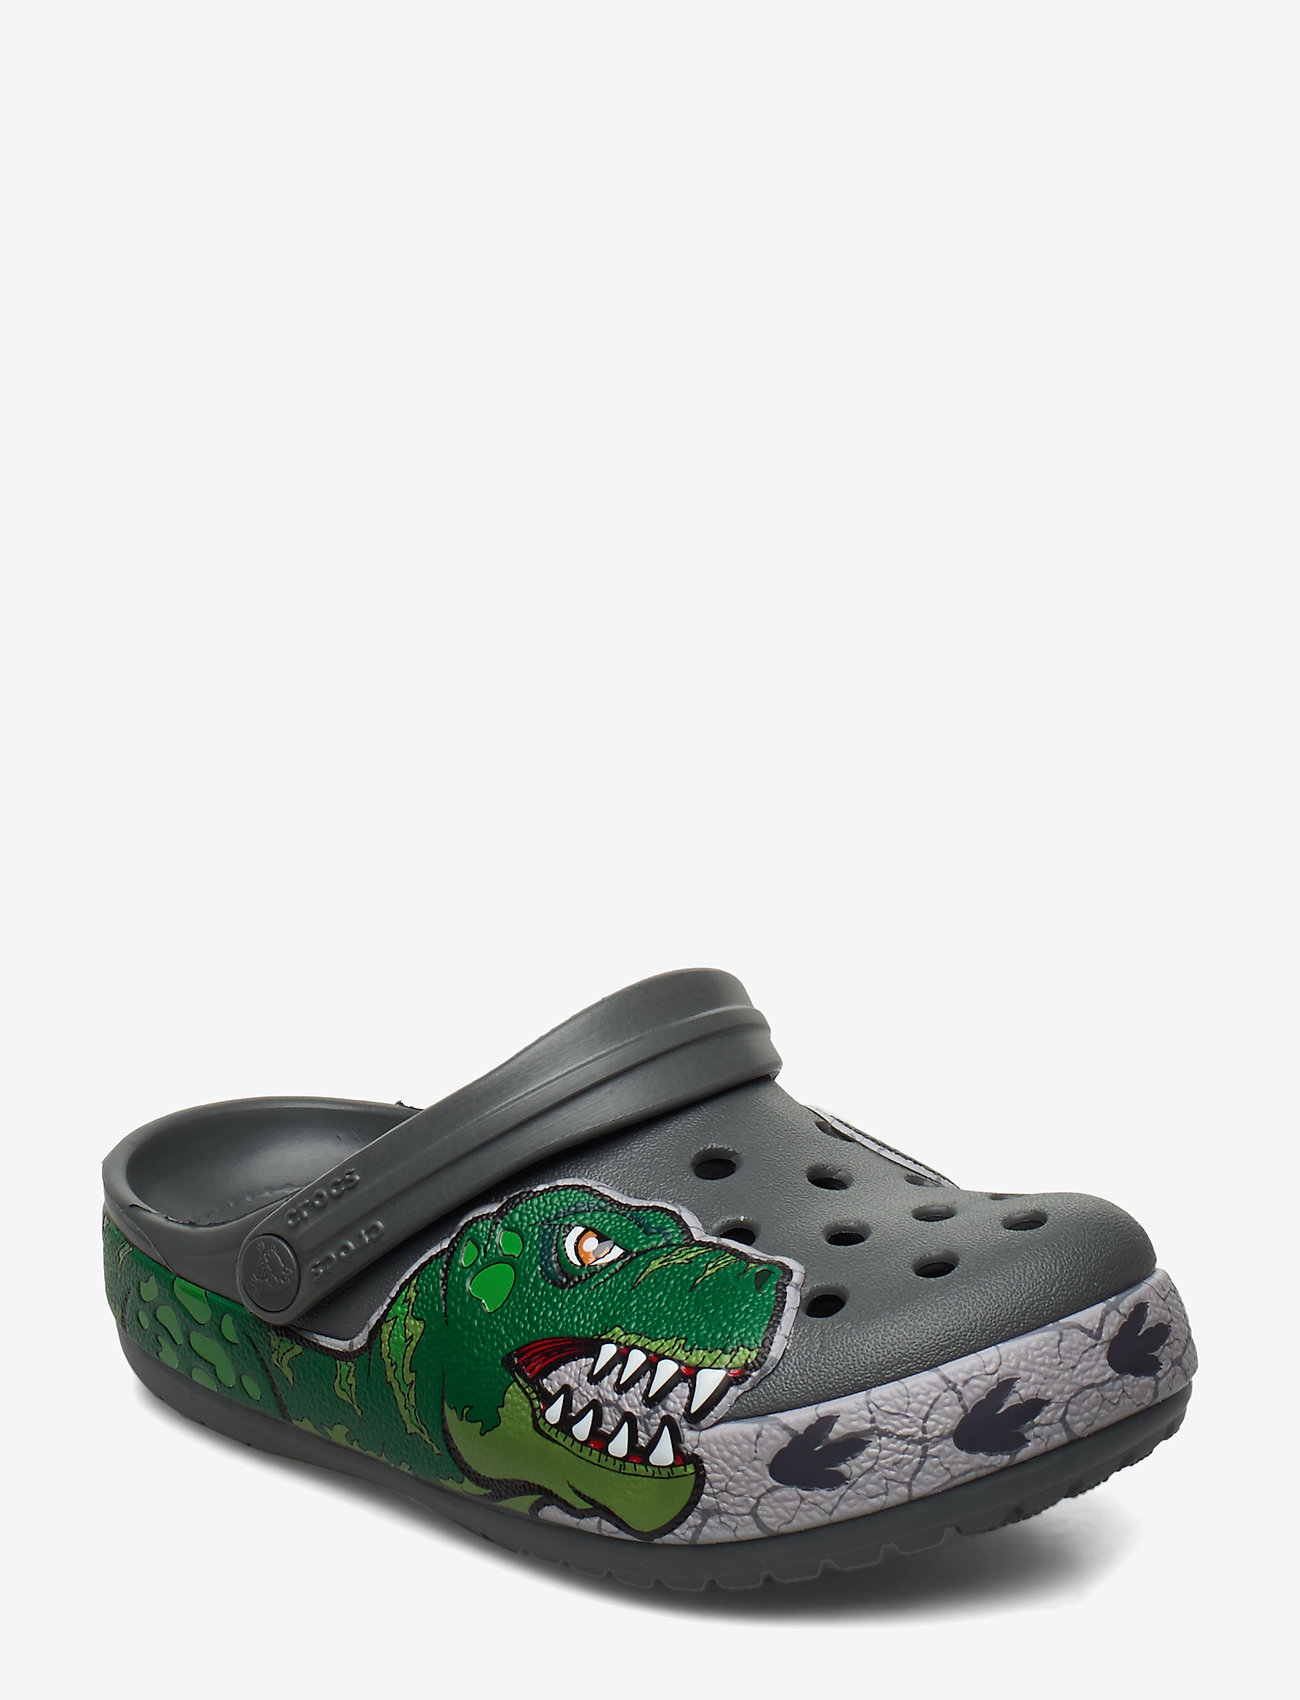 crocs light up